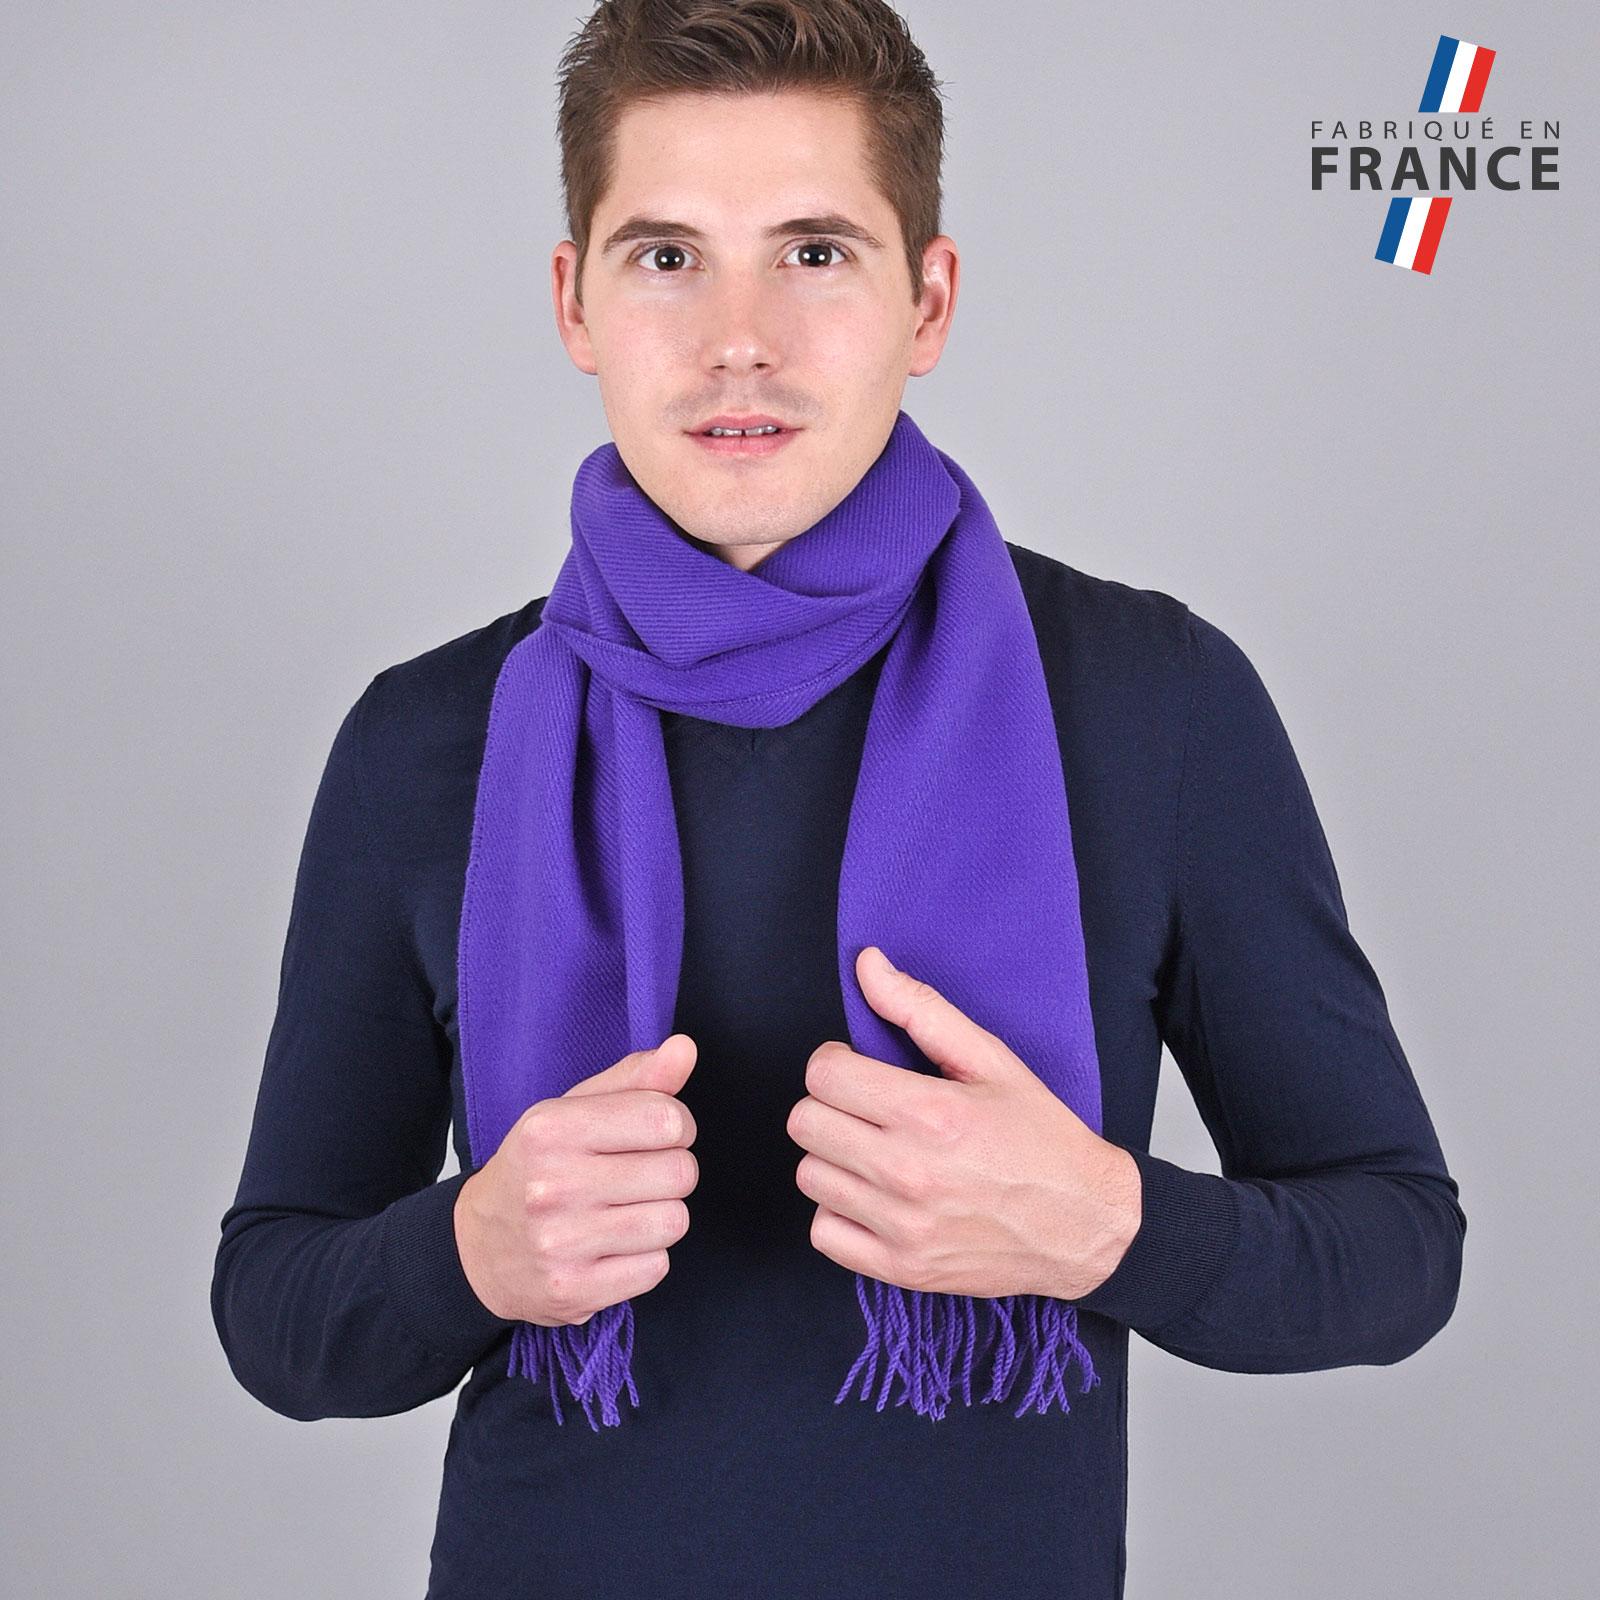 Echarpe violet indigo à franges - Fabriquée en France 0fc33c1ffb2